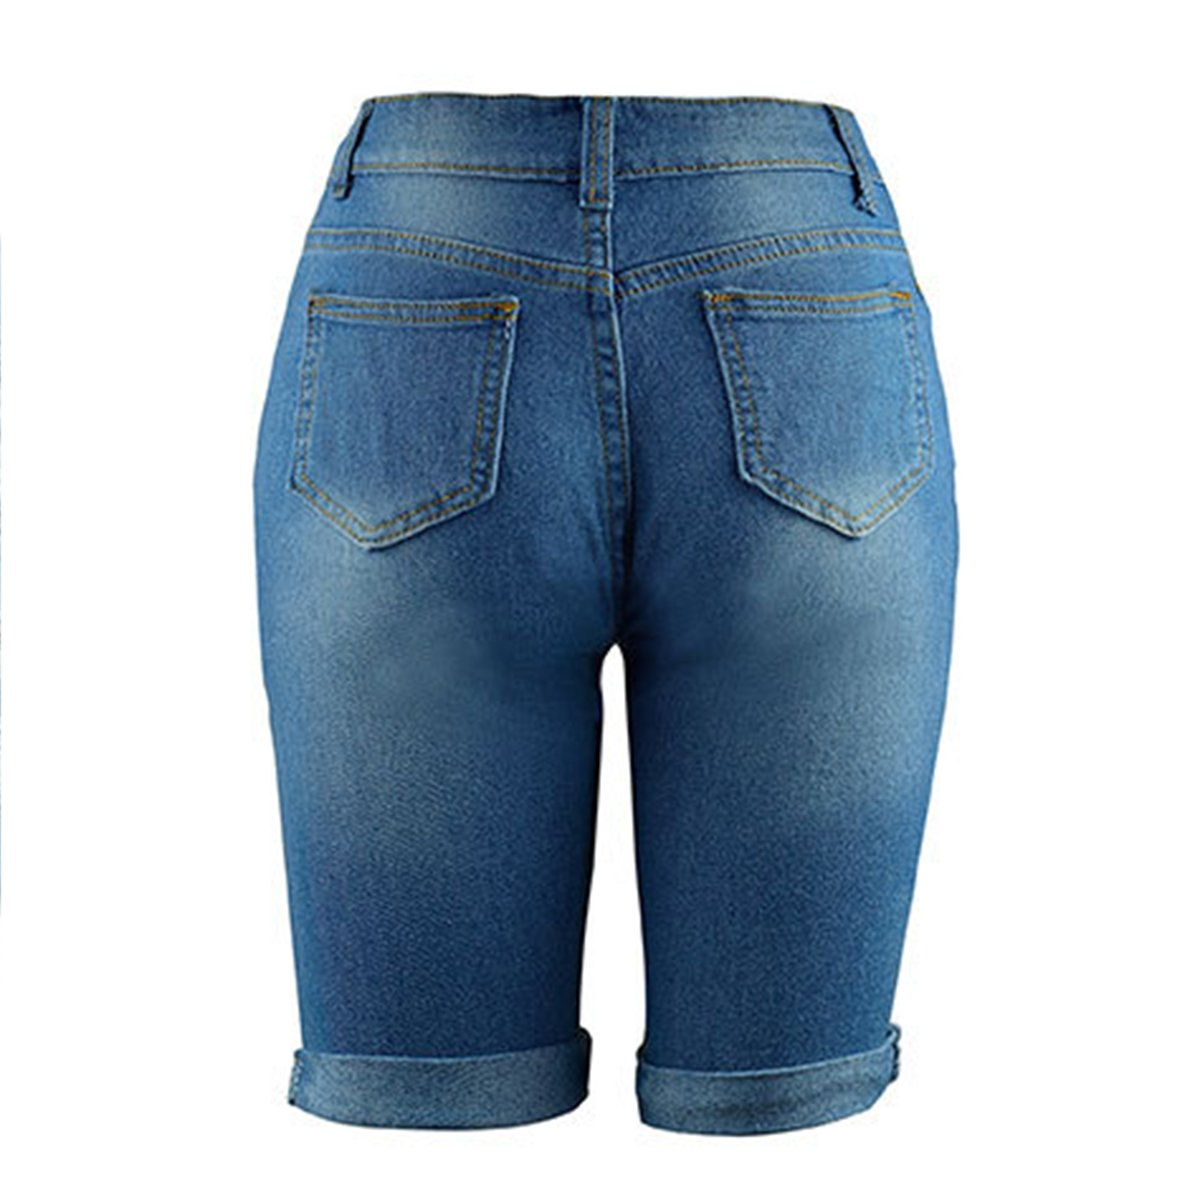 E.JAN1ST Womens Bermuda Shorts Mid Rise Stretchy Knee Length Denim Destroyed Shorts